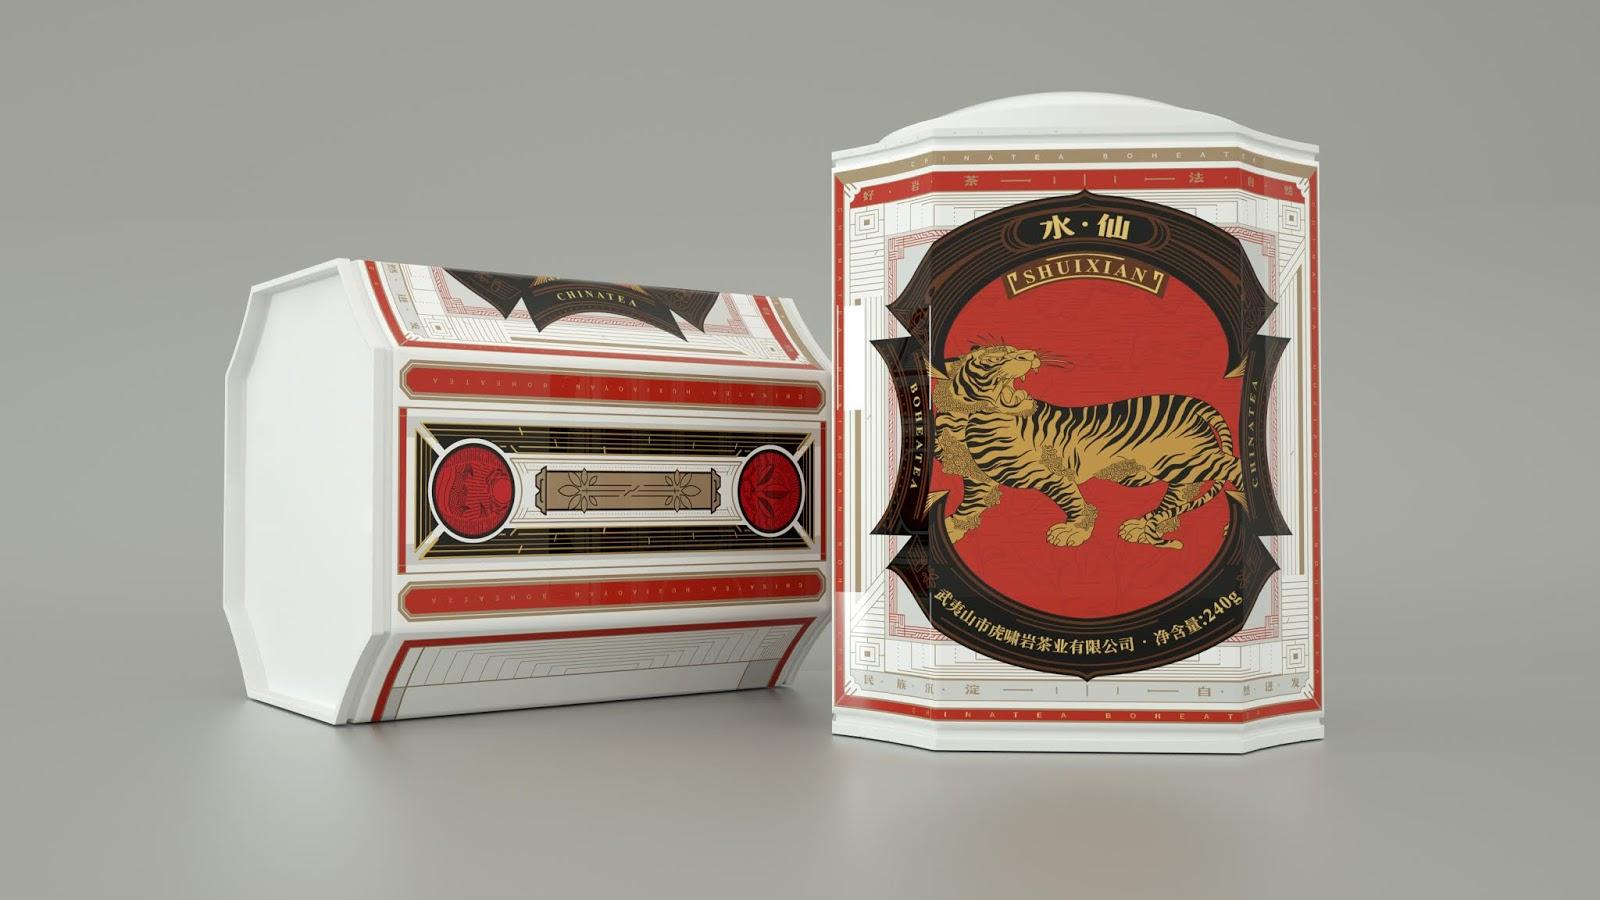 Wuyiyan Tea 图腾茶包装6